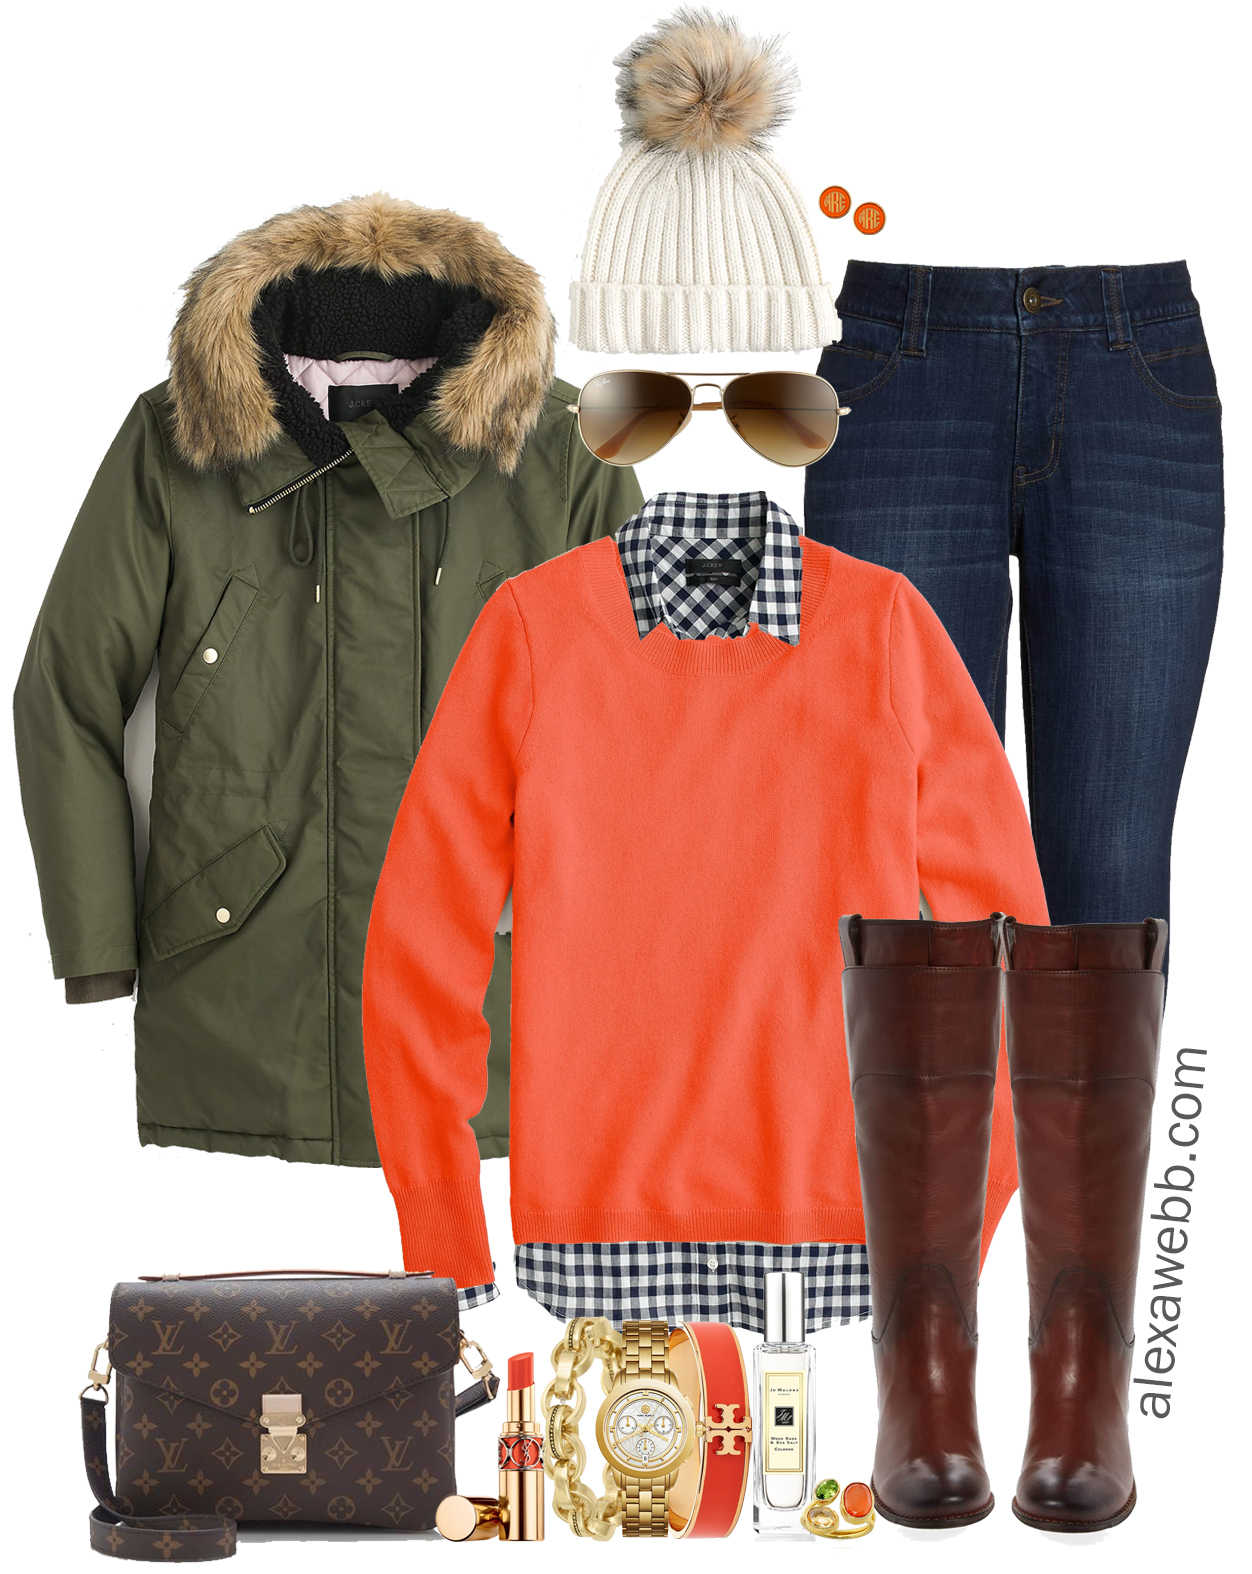 82c661bdd78ac Plus Size Orange Sweater Outfit - Alexa Webb